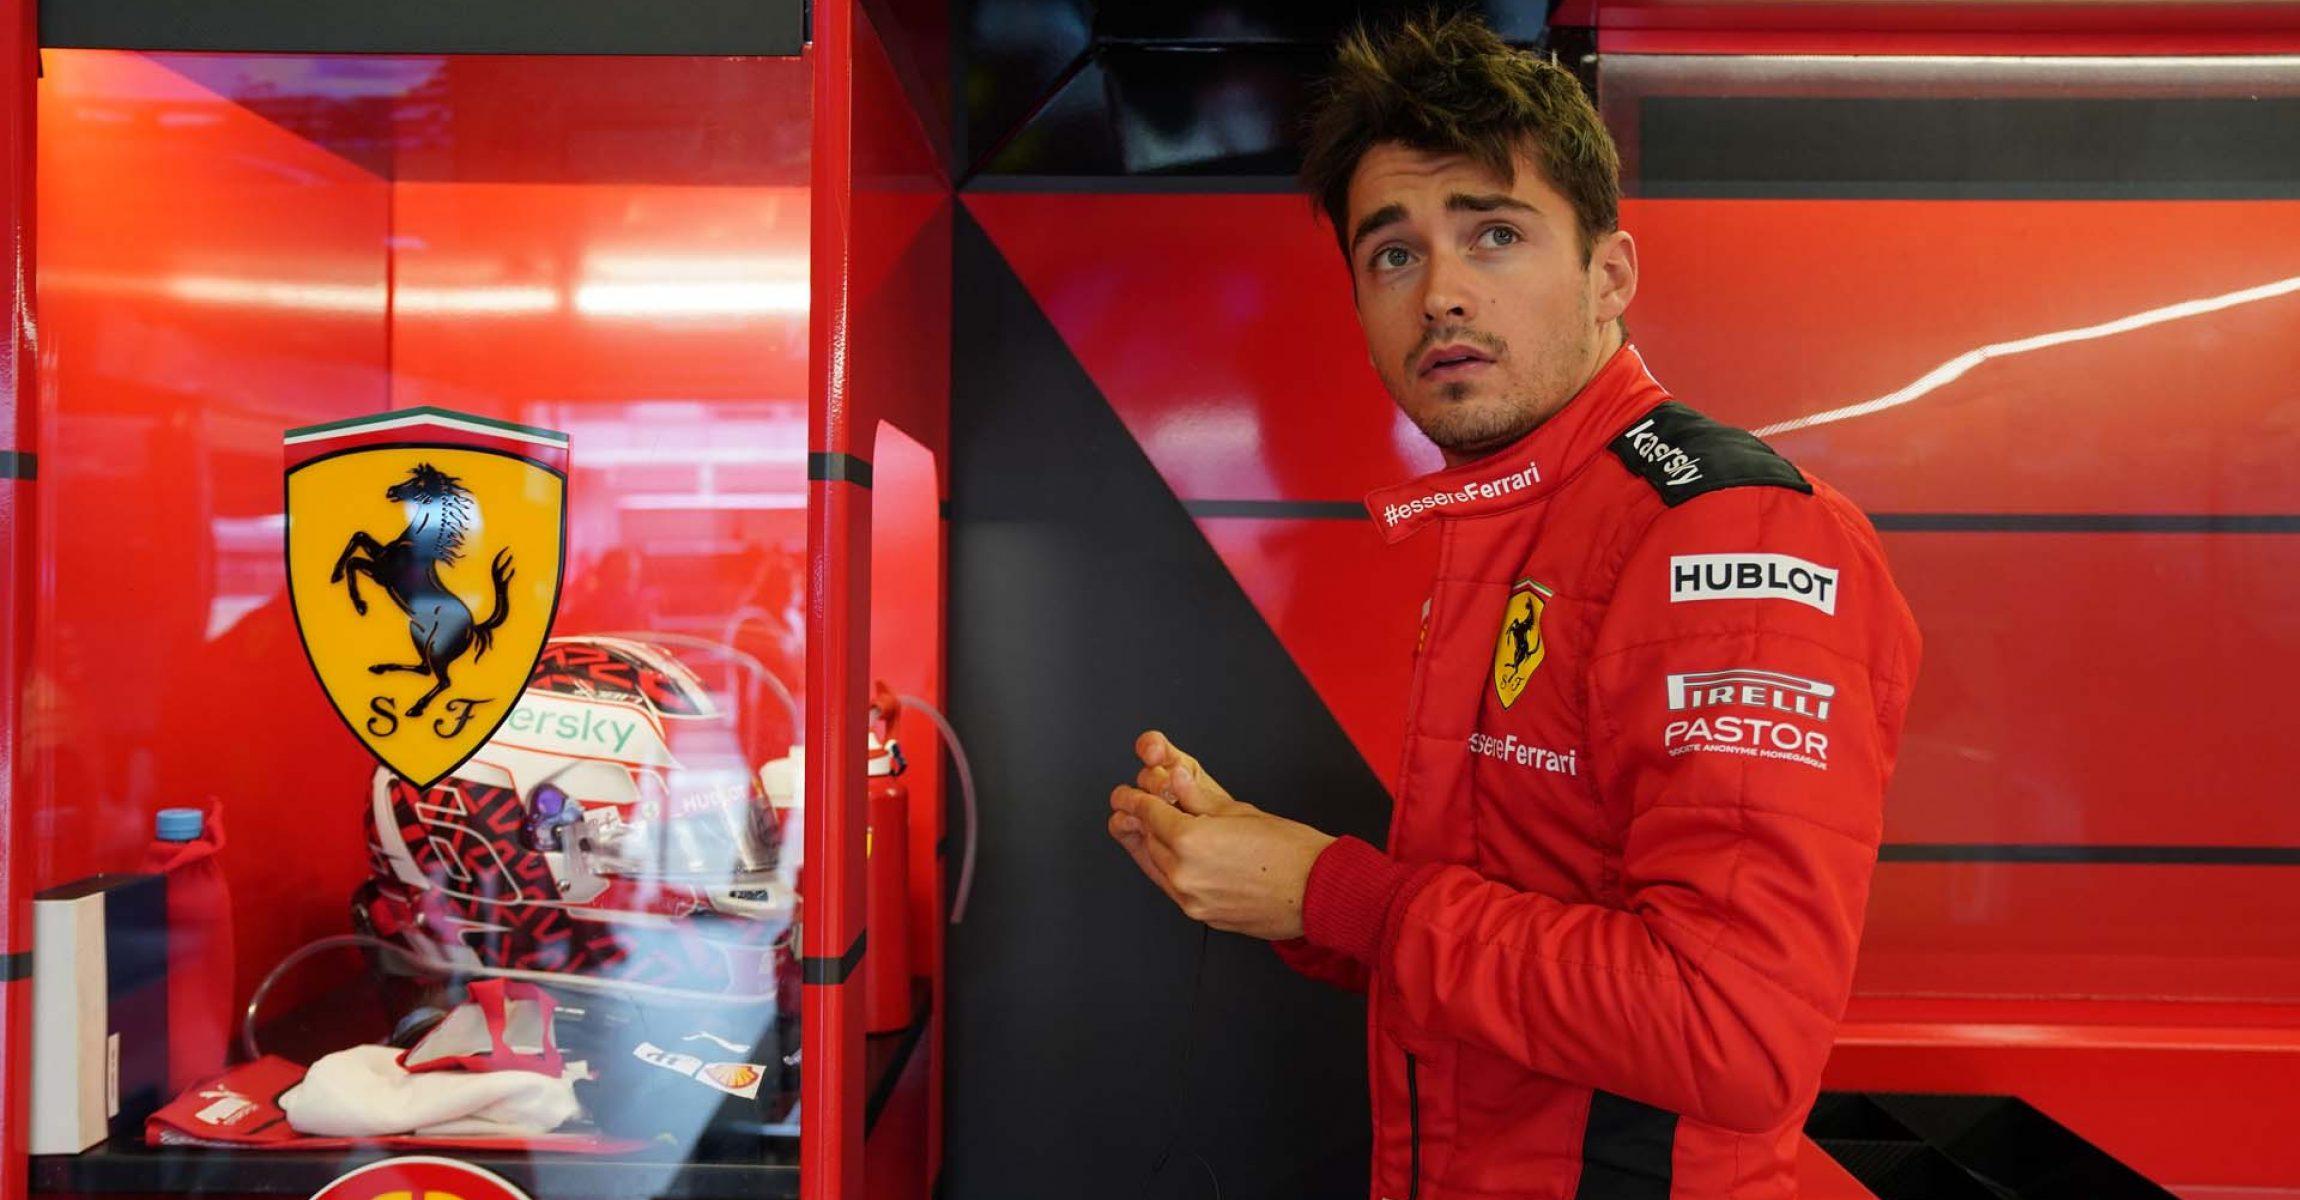 GP GERMANIA F1/2020 -  DOMENICA 11/10/2020   credit: @Scuderia Ferrari Press Office Charles Leclerc Ferrari